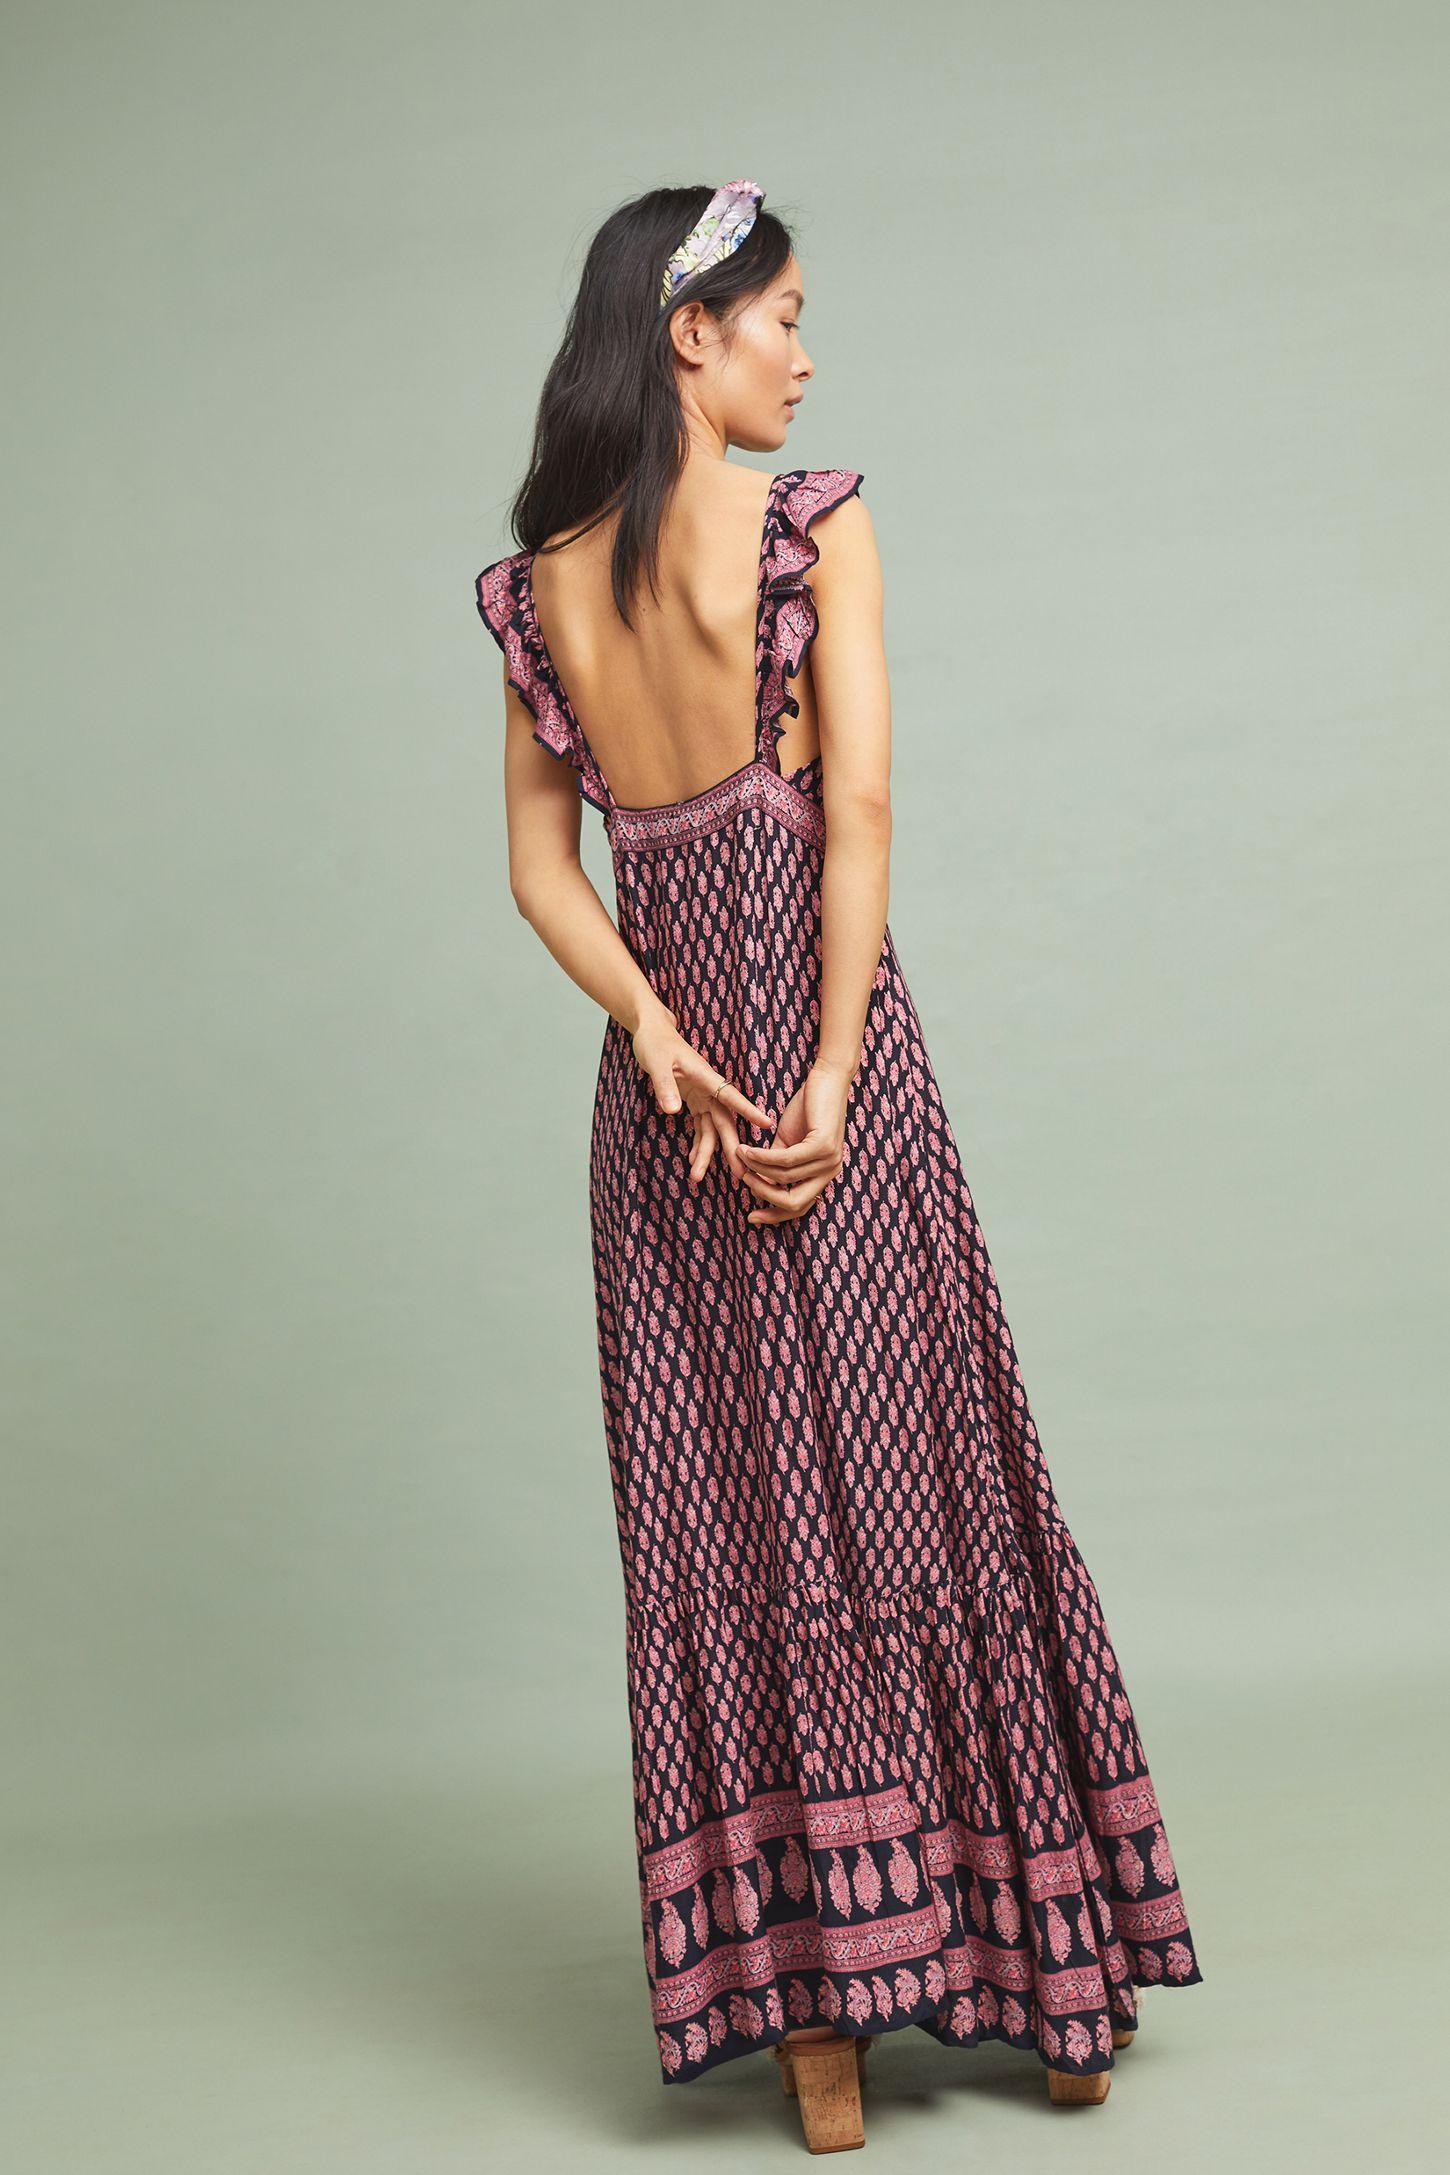 e4c52e86784 Summer Maxi Dresses For Petites Uk - Gomes Weine AG